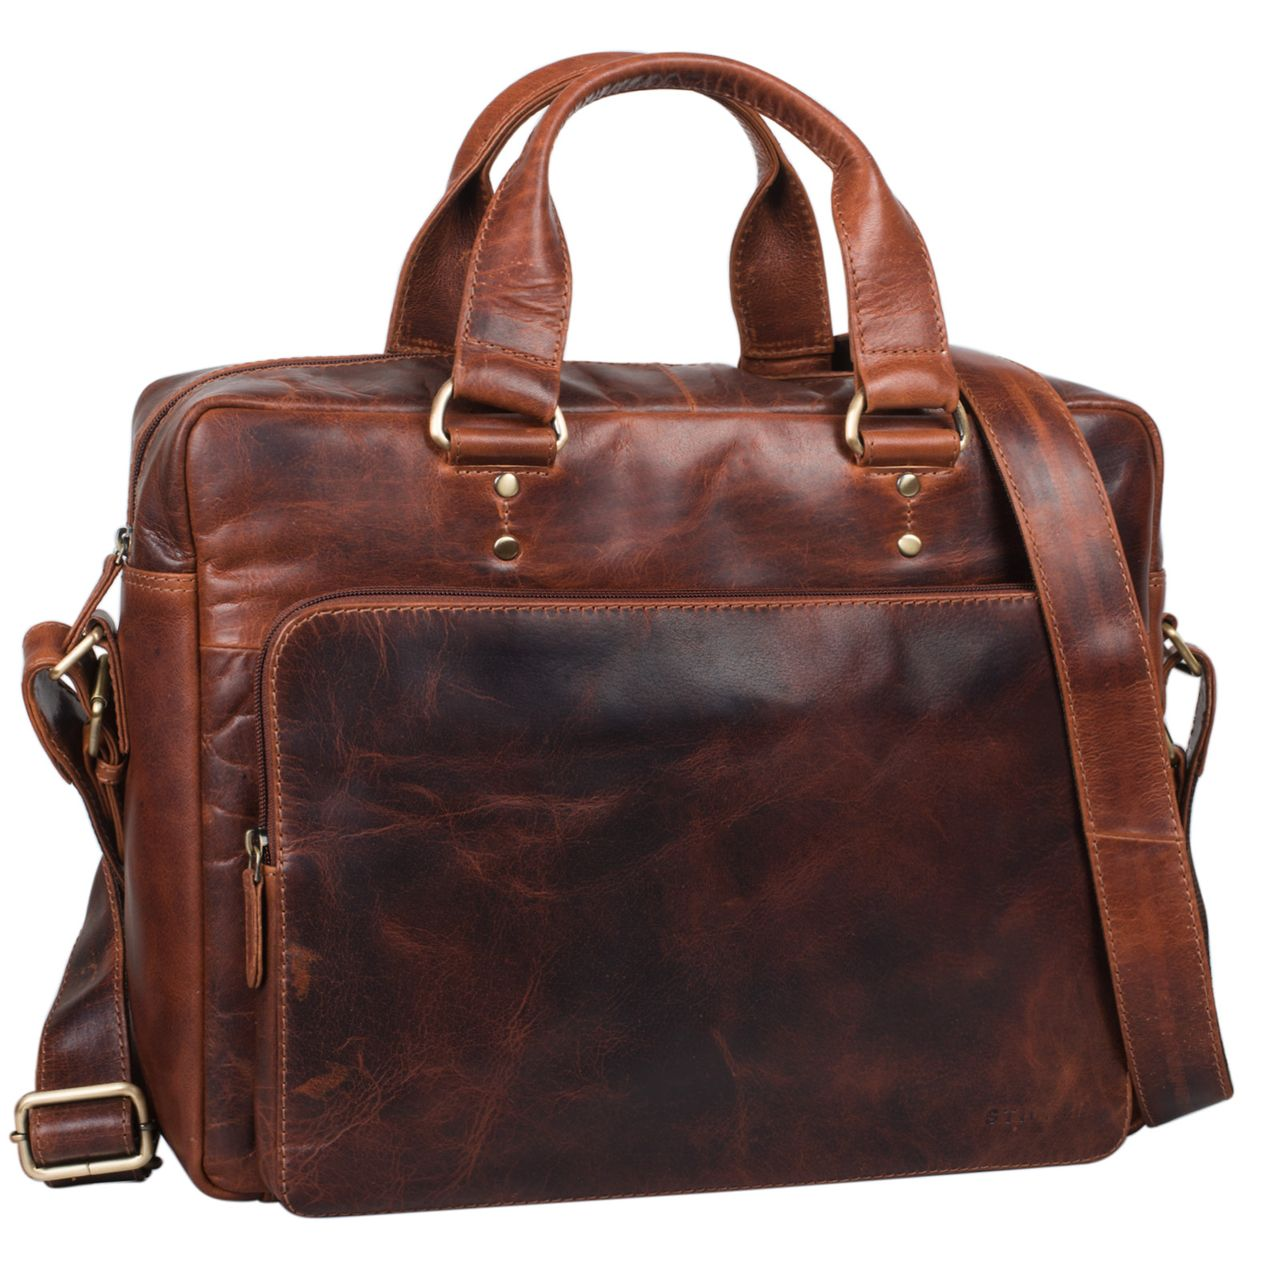 stilord joshua vintage businesstasche leder gro herren laptoptasche 13 3 zoll b rotasche. Black Bedroom Furniture Sets. Home Design Ideas